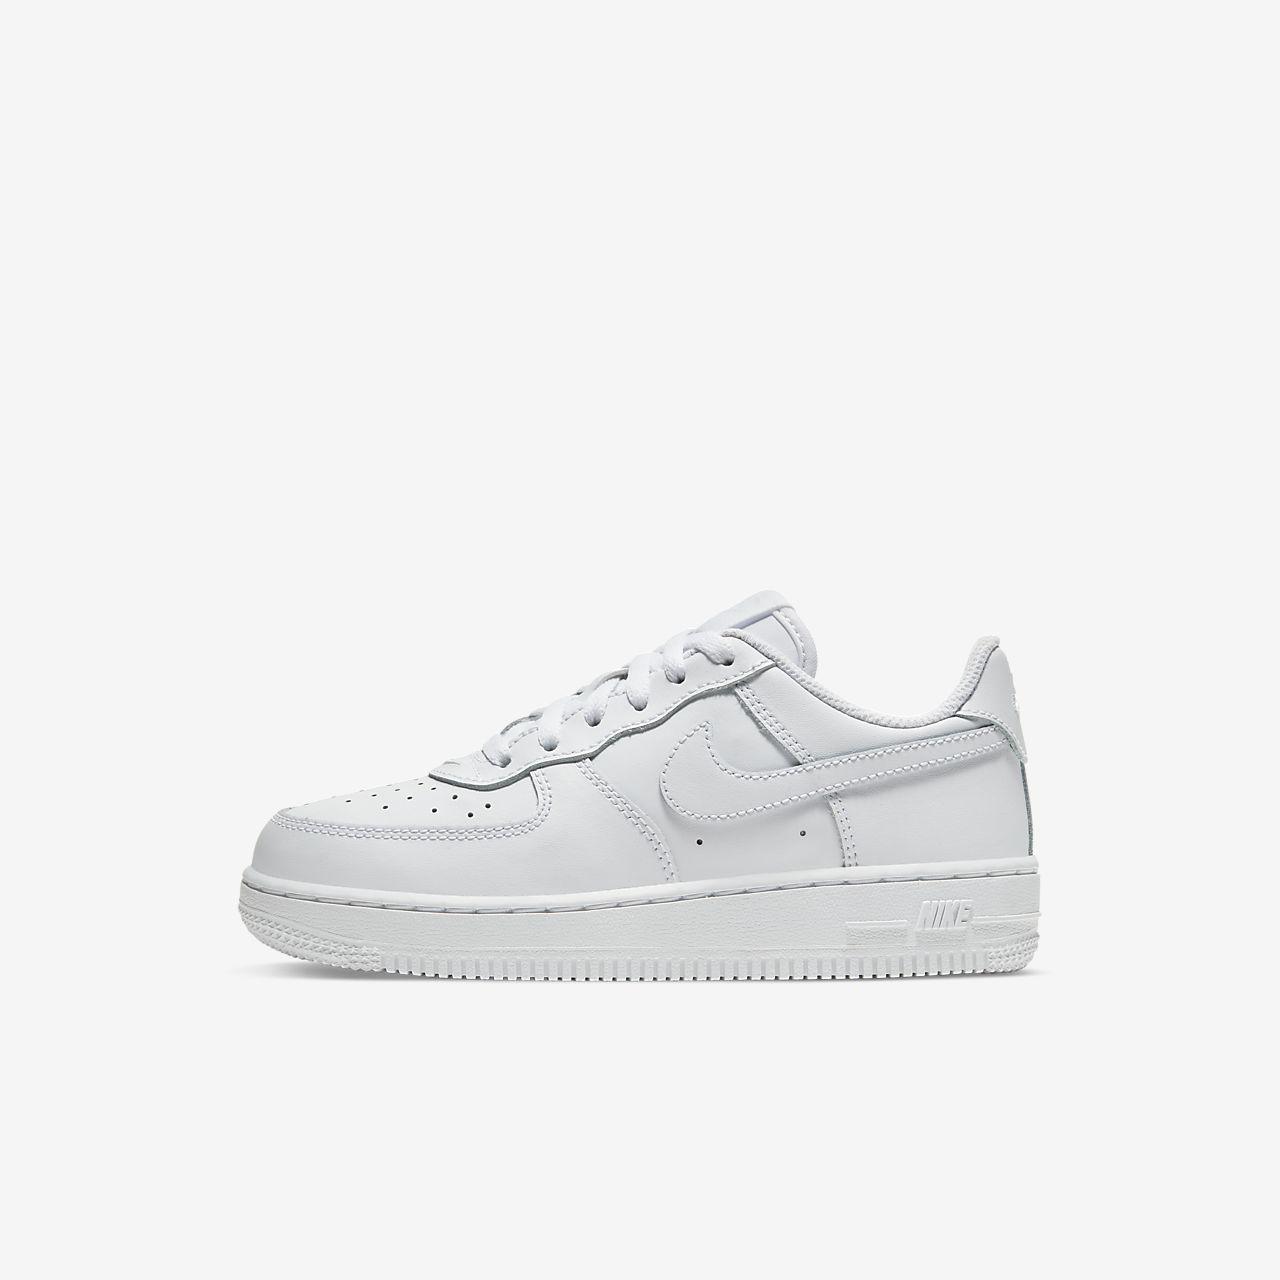 6062a0a2797 Nike Force 1 sko til små barn. Nike.com NO